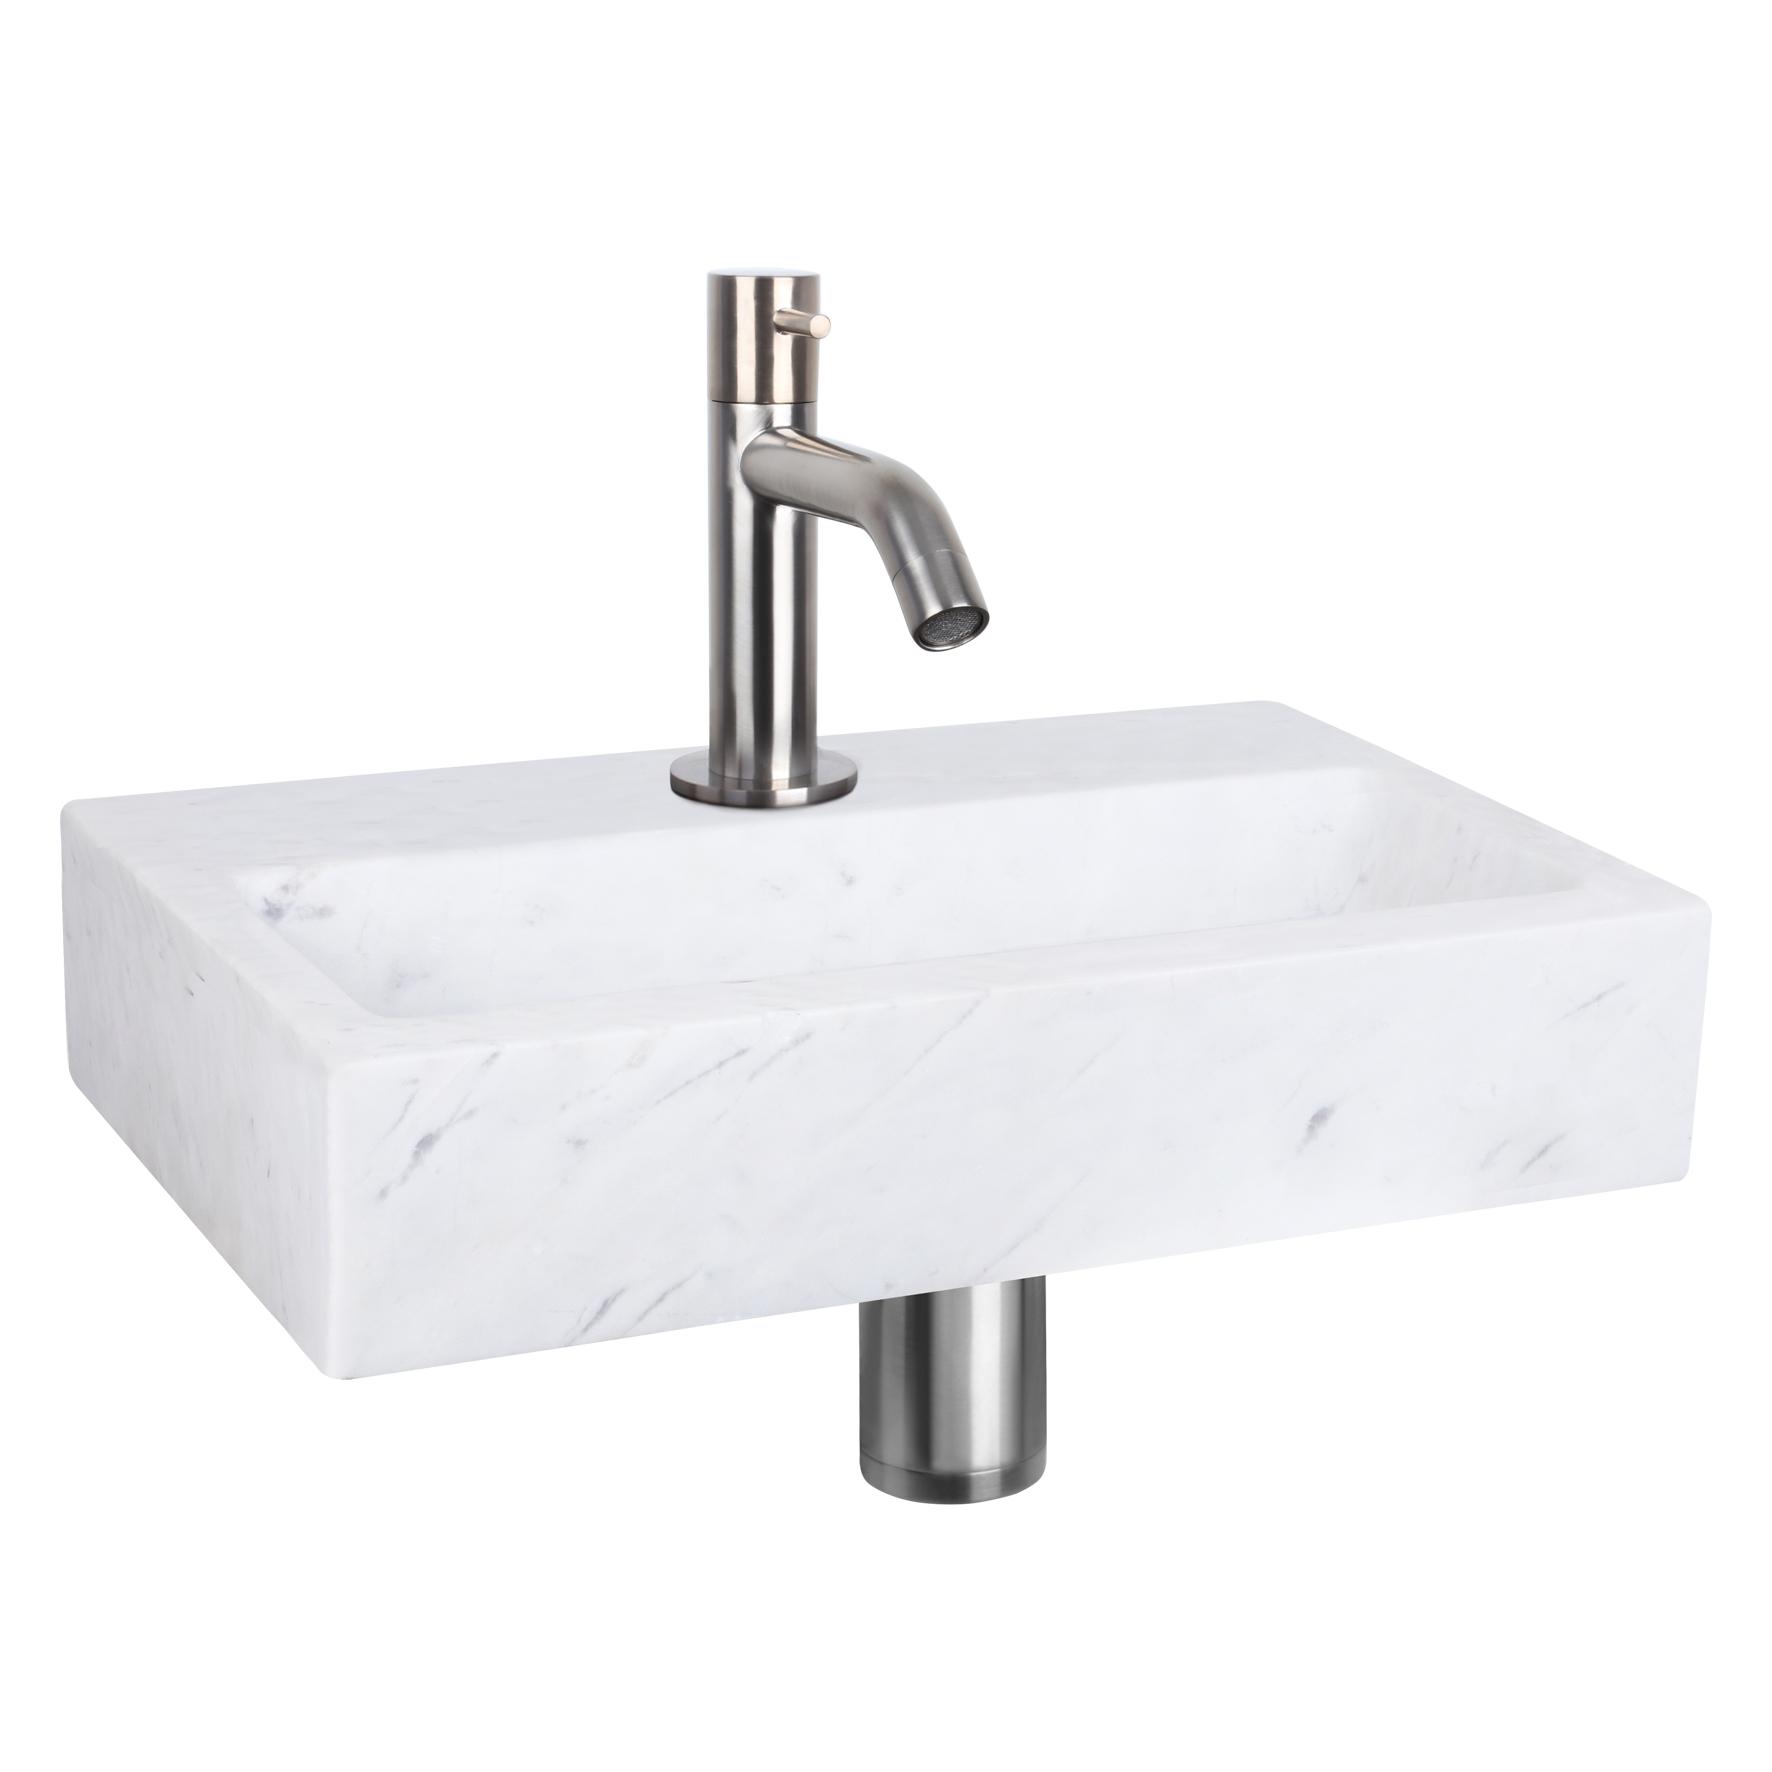 Flat fonteinset - Marmer - Kraan gebogen mat chroom